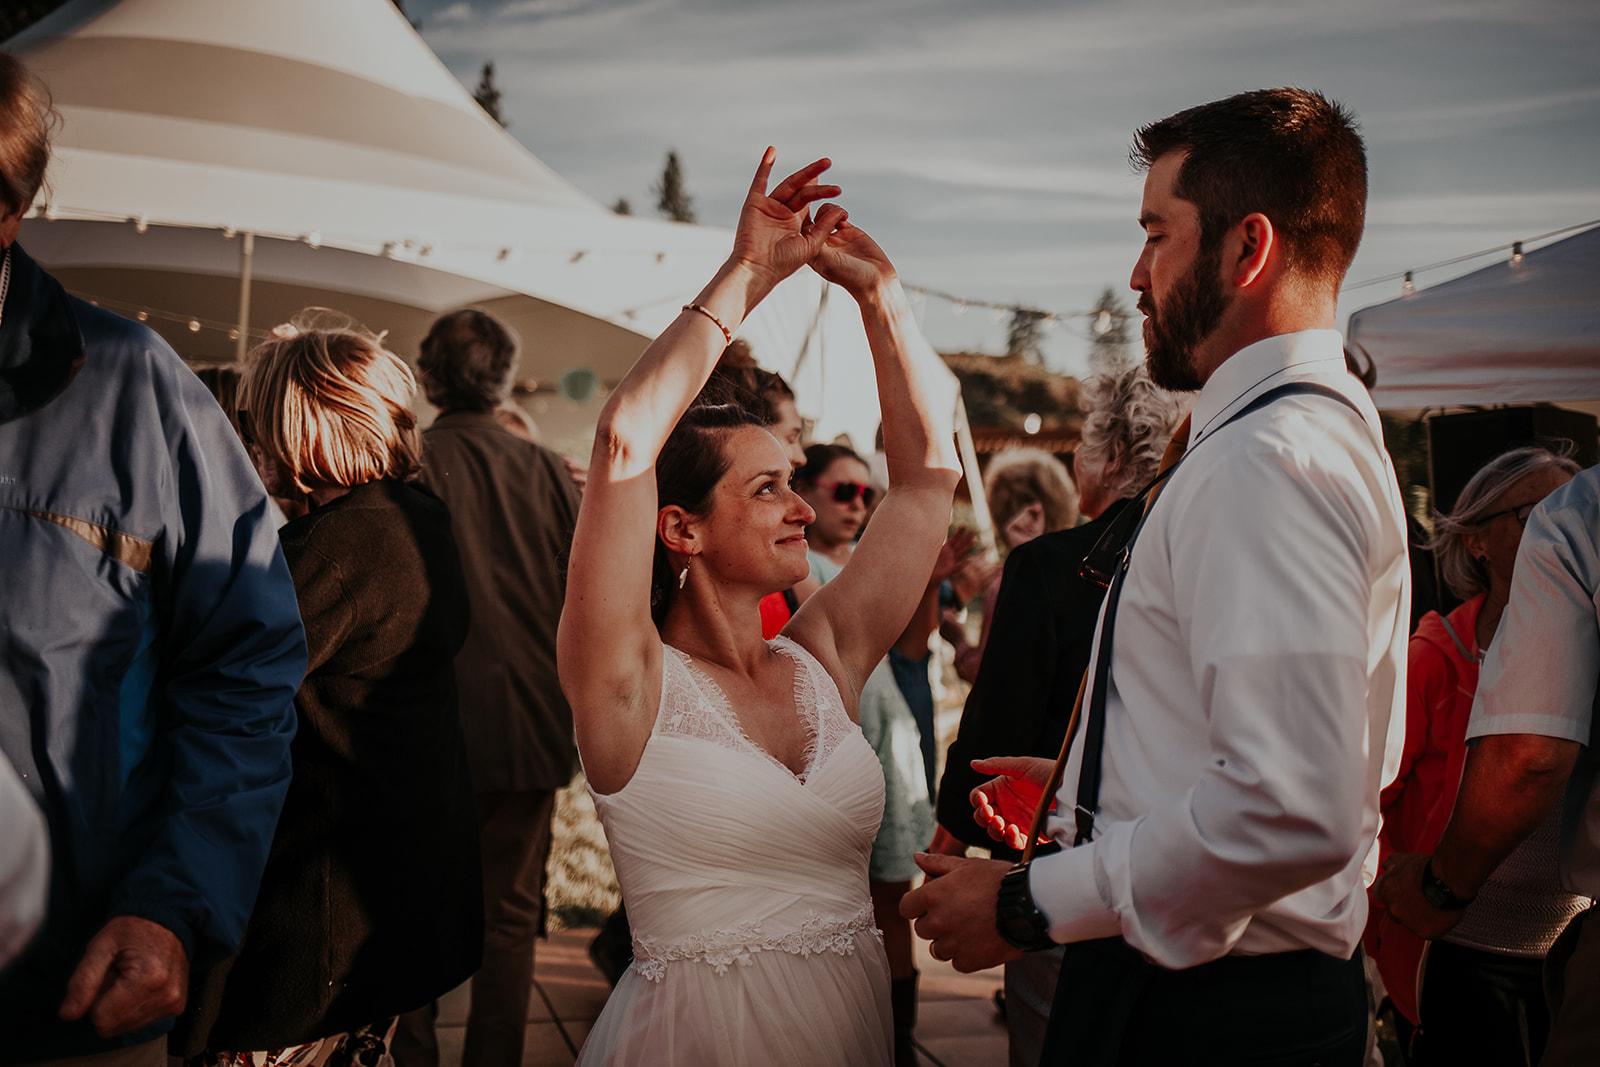 north-cascades-elopement-wedding-winthrop-wedding-photographer-megan-gallagher-photography (30).jpg